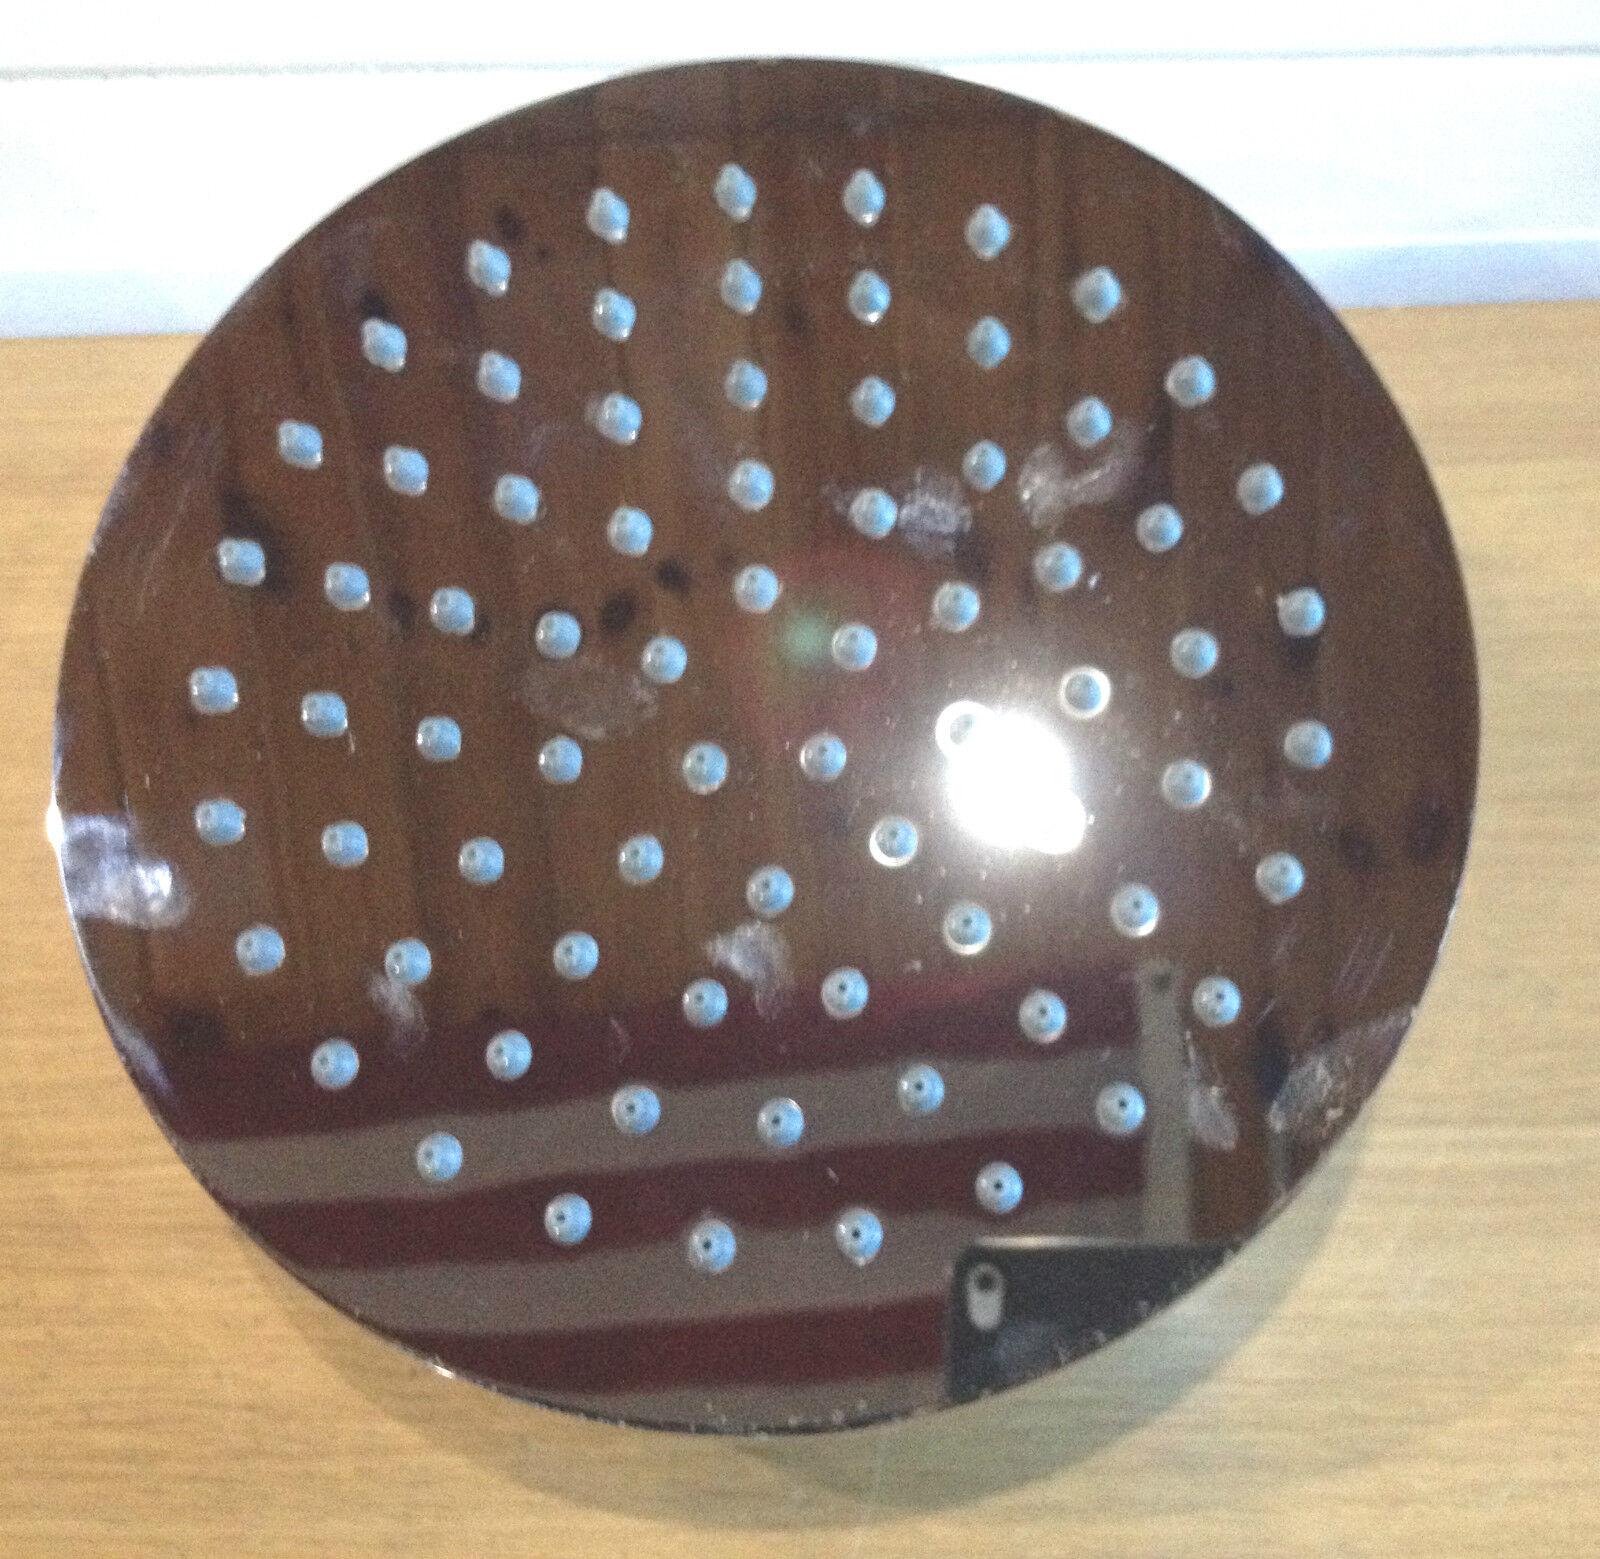 200 mm diámetro fijo ducha cabeza por Hudson Reed cabeza en Suite de baño de 85